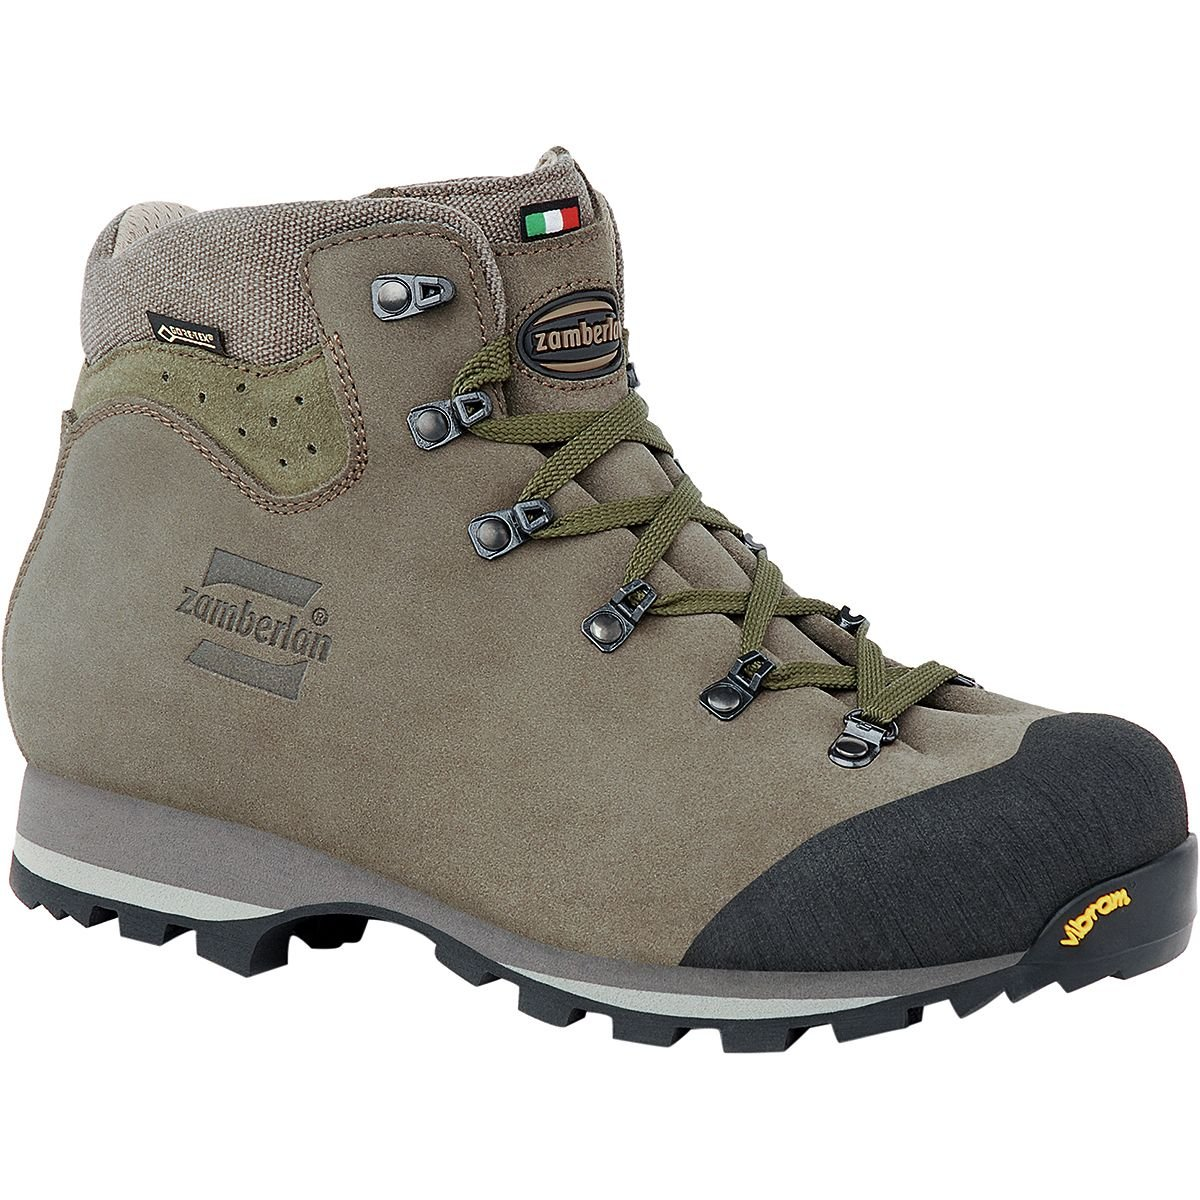 404f293d619 Zamberlan Trackmaster GTX RR Hiking Boot - Men's: Amazon.ca: Shoes ...